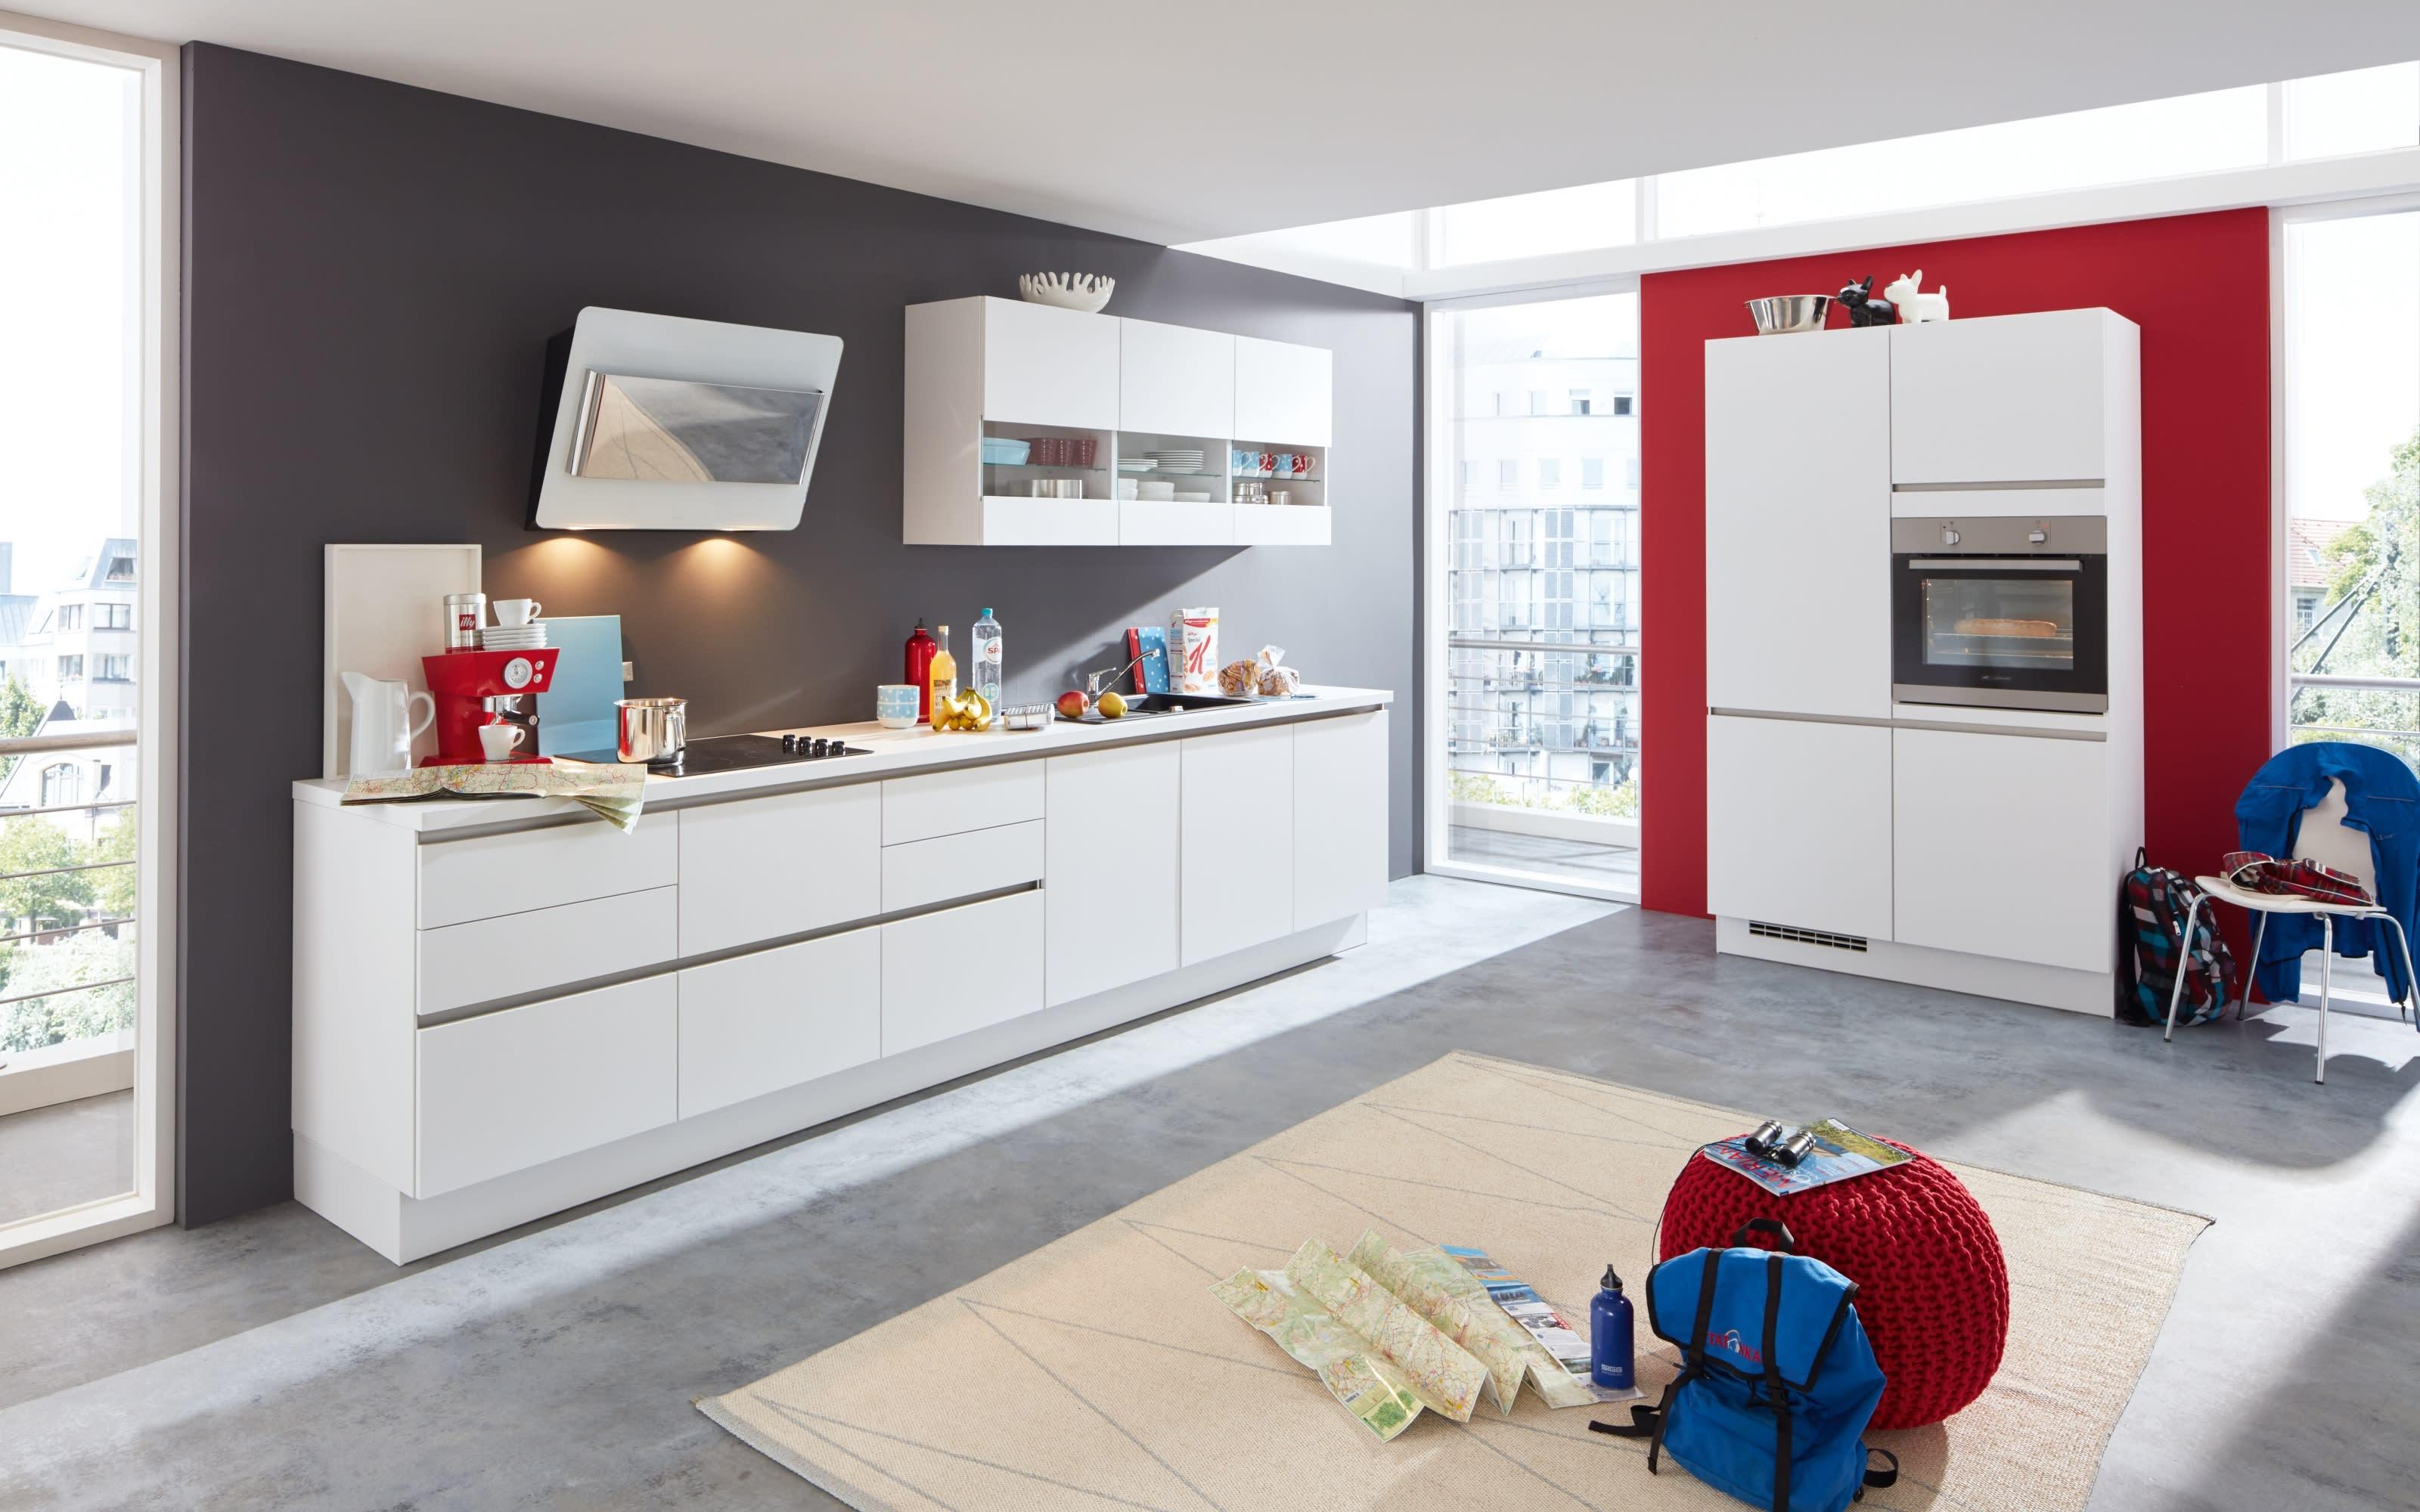 Einbauküche Laser, alpinweiß, inklusive Elektrogeräte, inklusive AEG Geschirrspüler